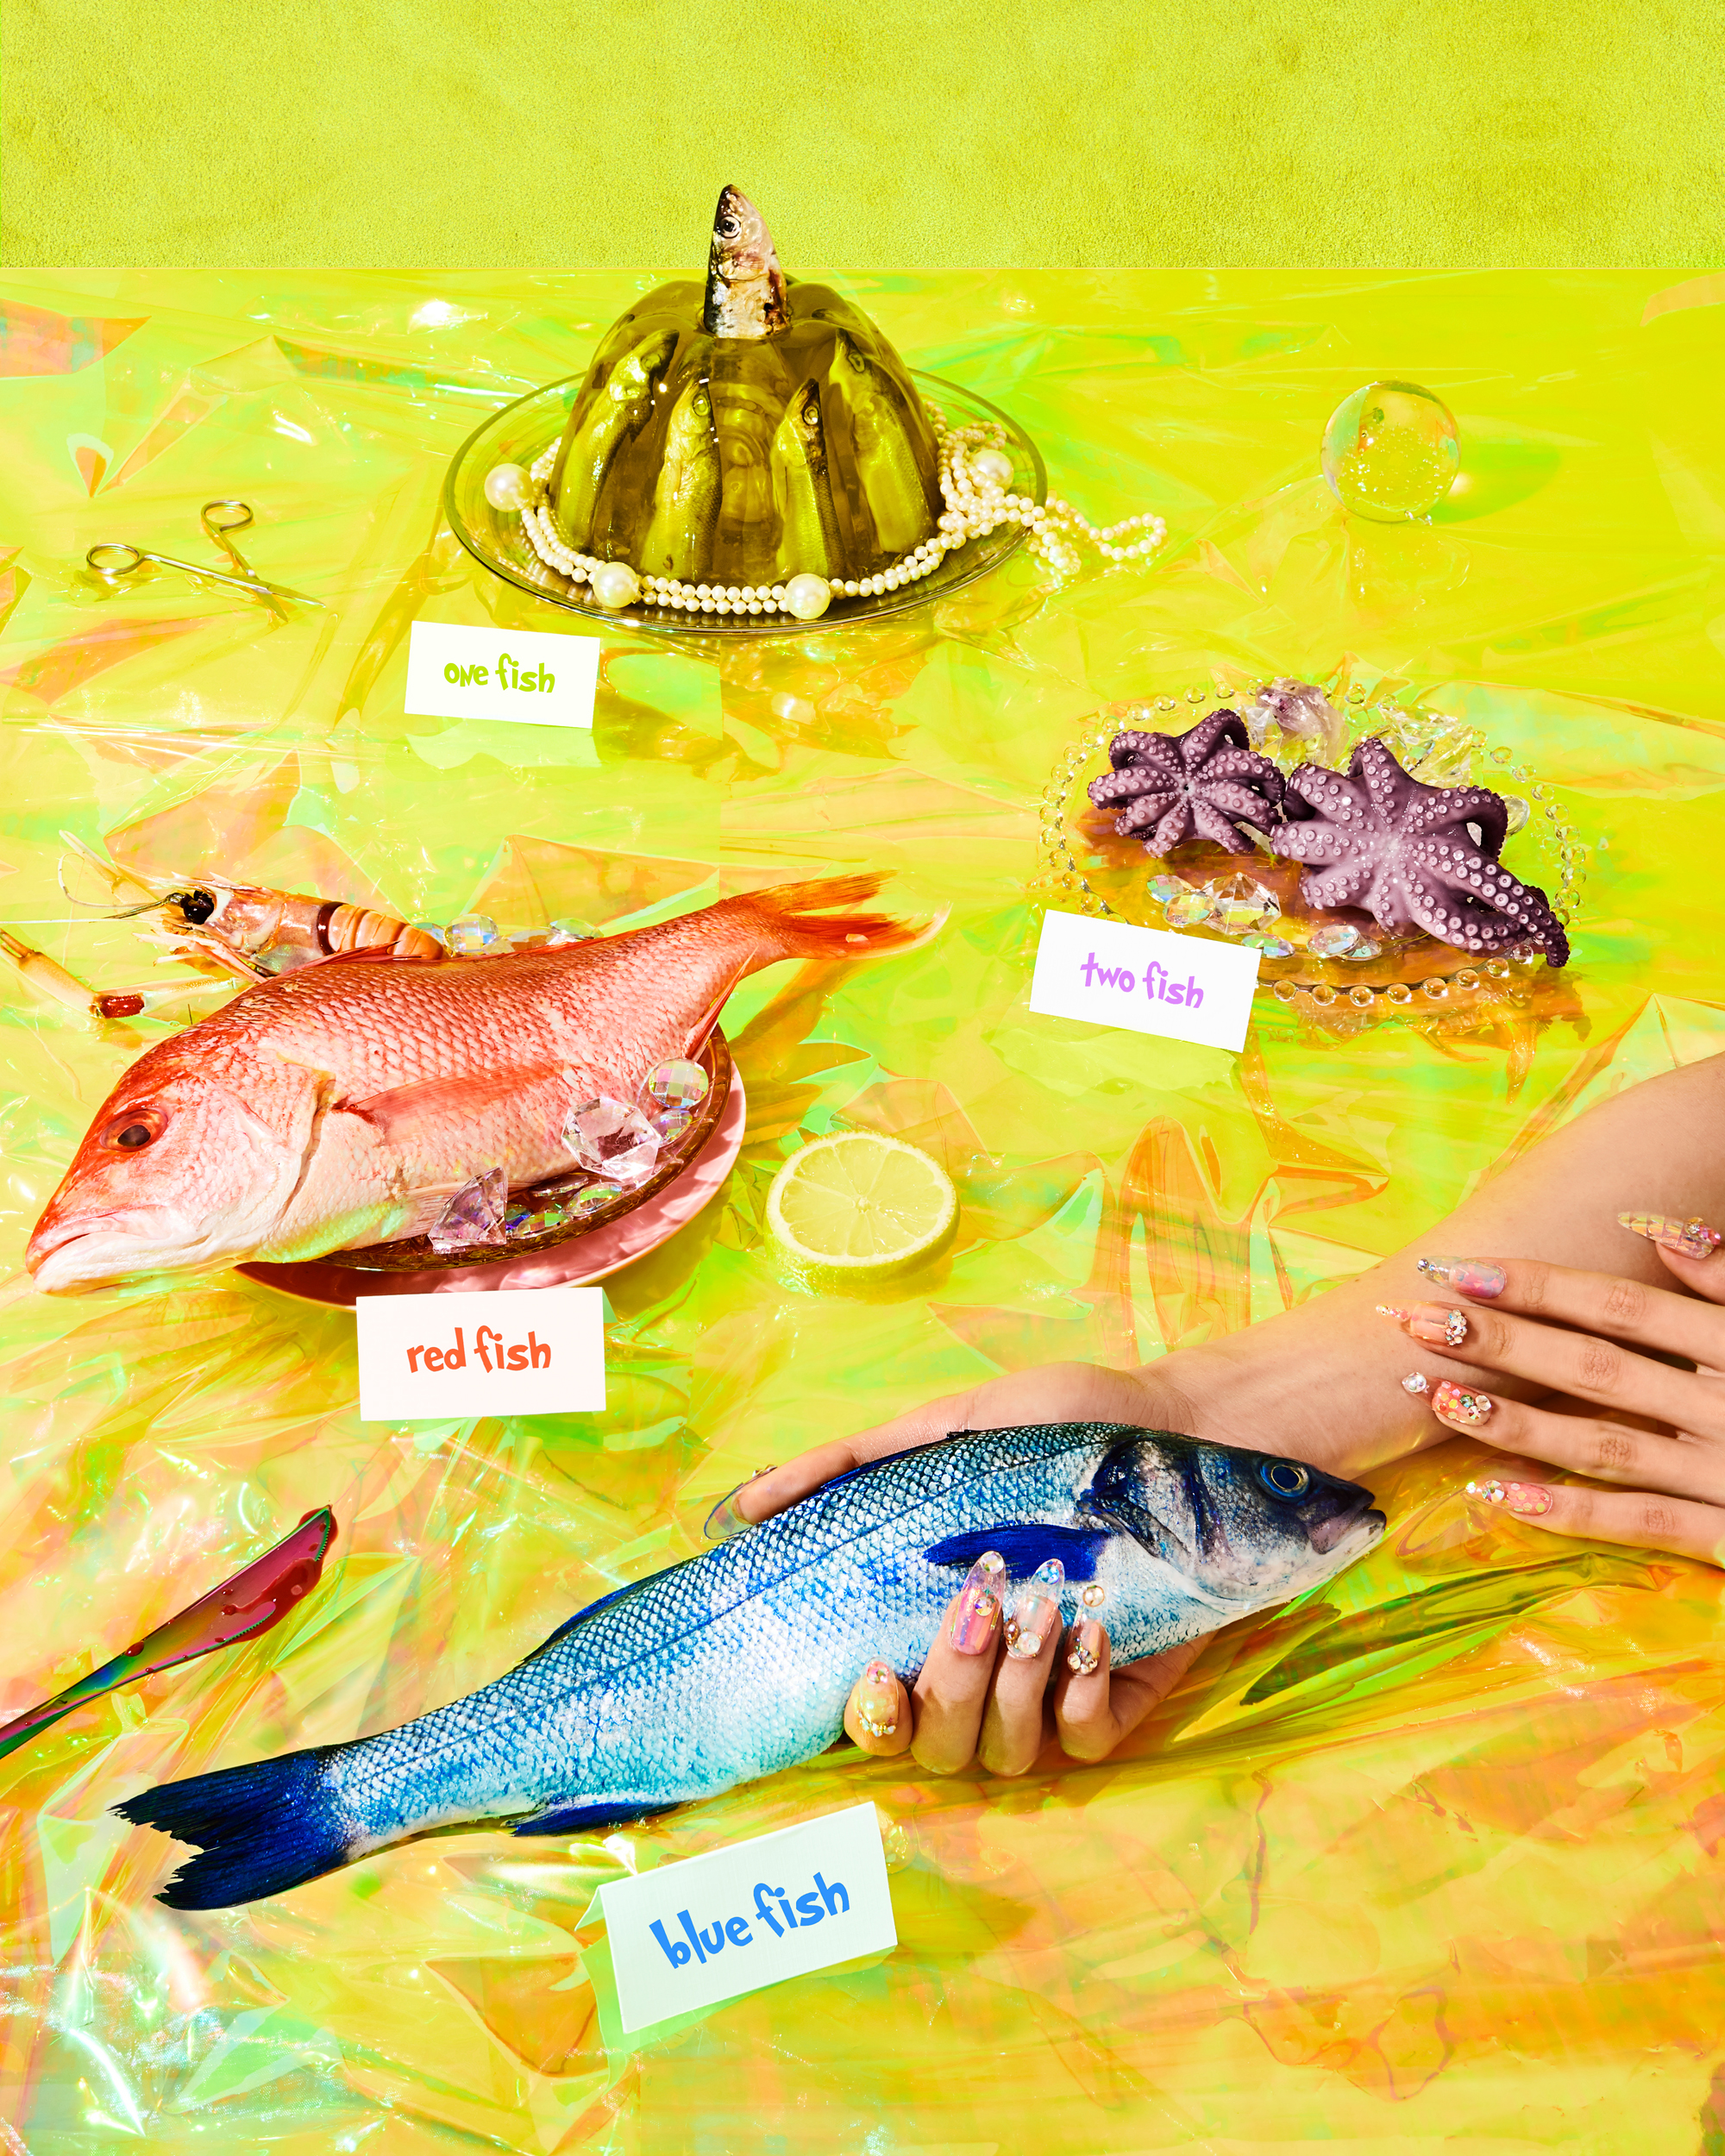 1_fish_two_fish_hannibal_seuss_jenna_gang_.jpg